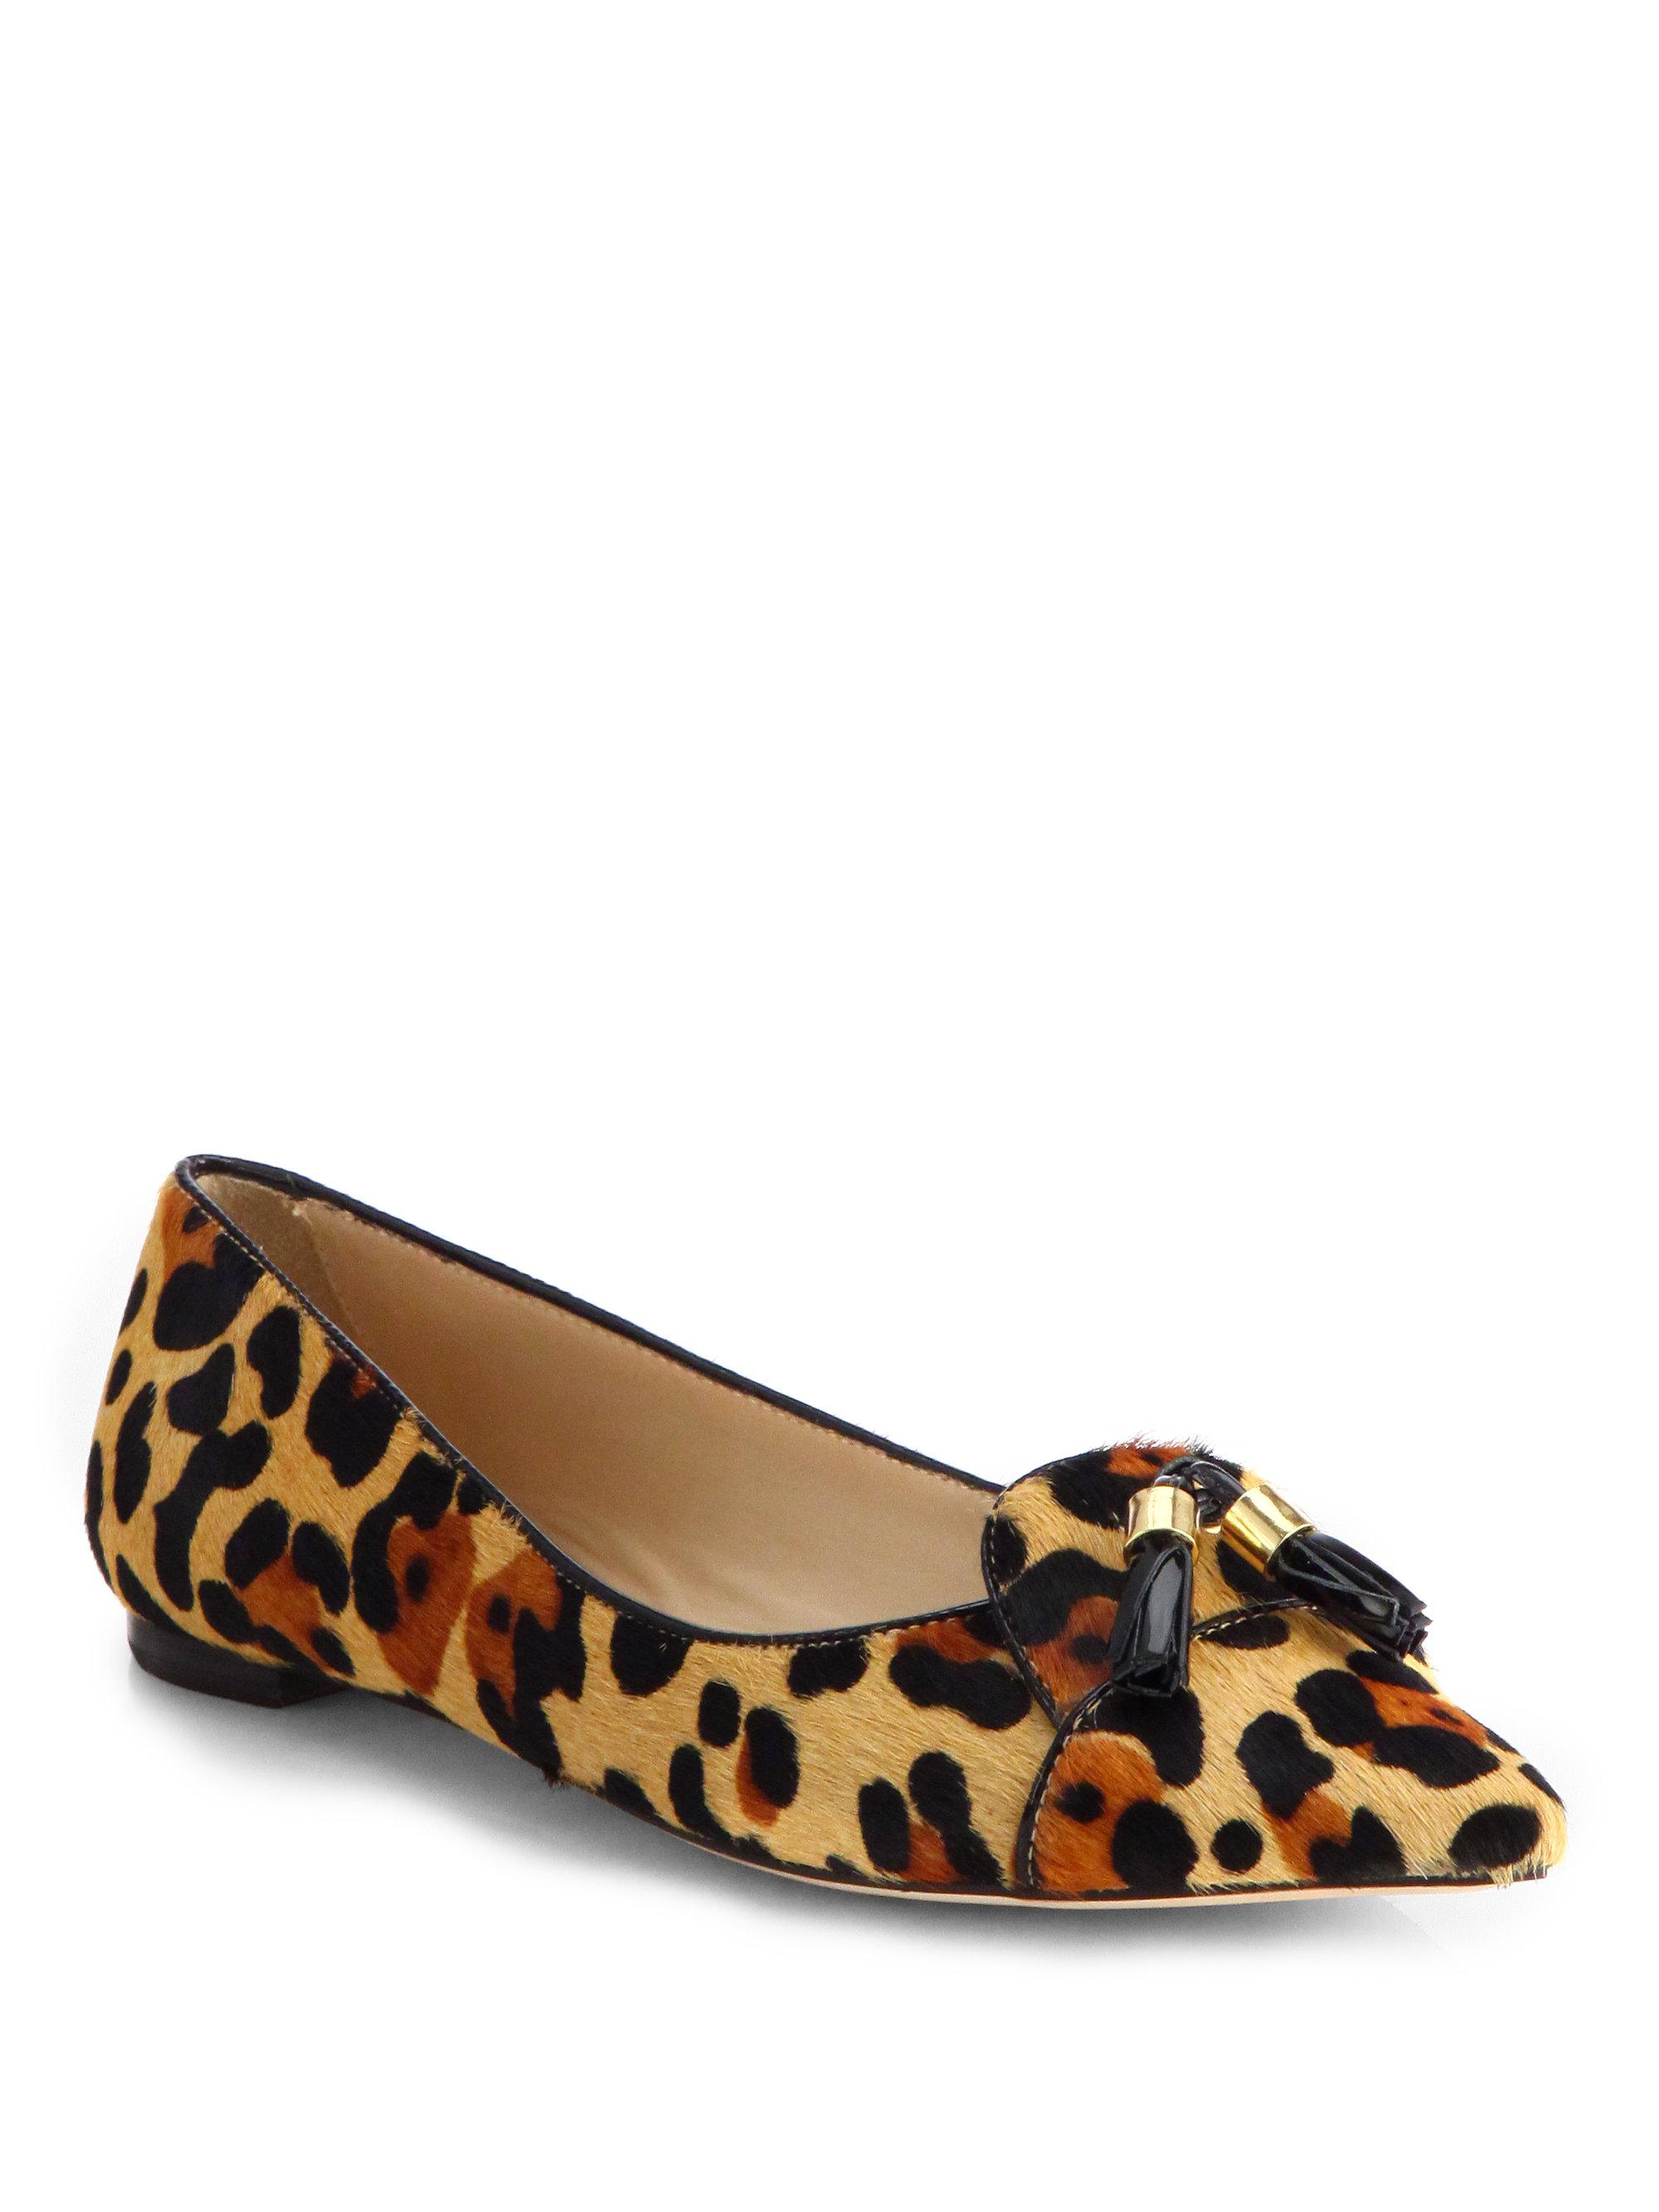 Kate spade new york grenada leopard calf hair flats in for Kate spade new york flats